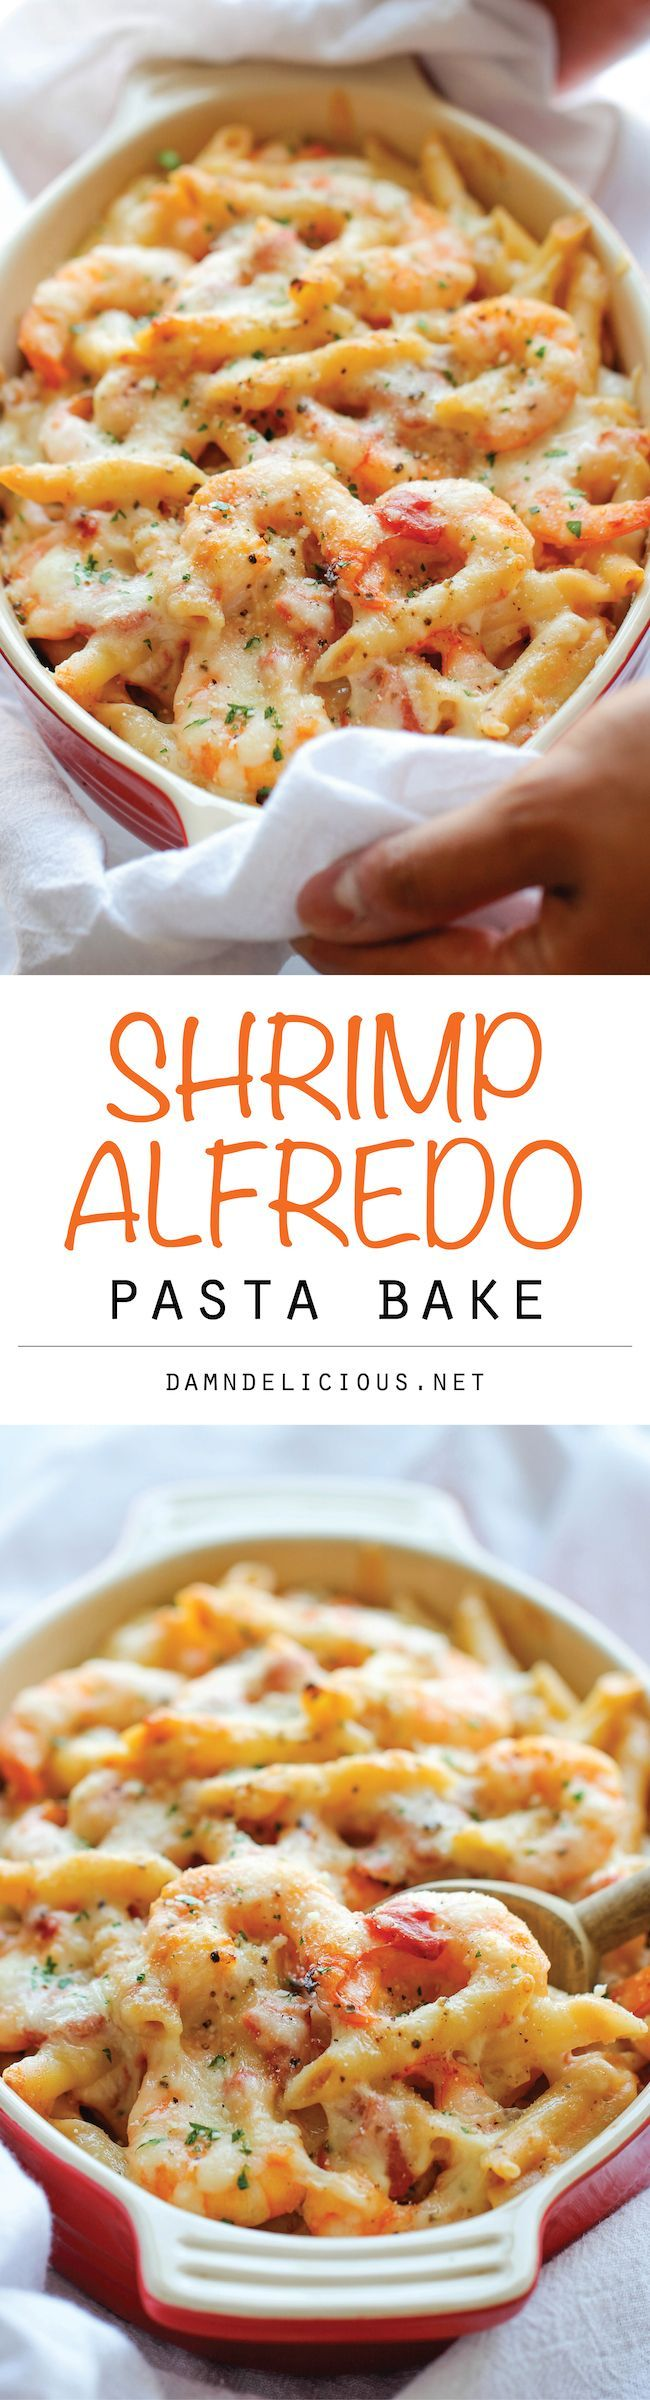 Skinny Shrimp Alfredo Pasta Bake - An unbelievably cheesy, creamy lightened-up…